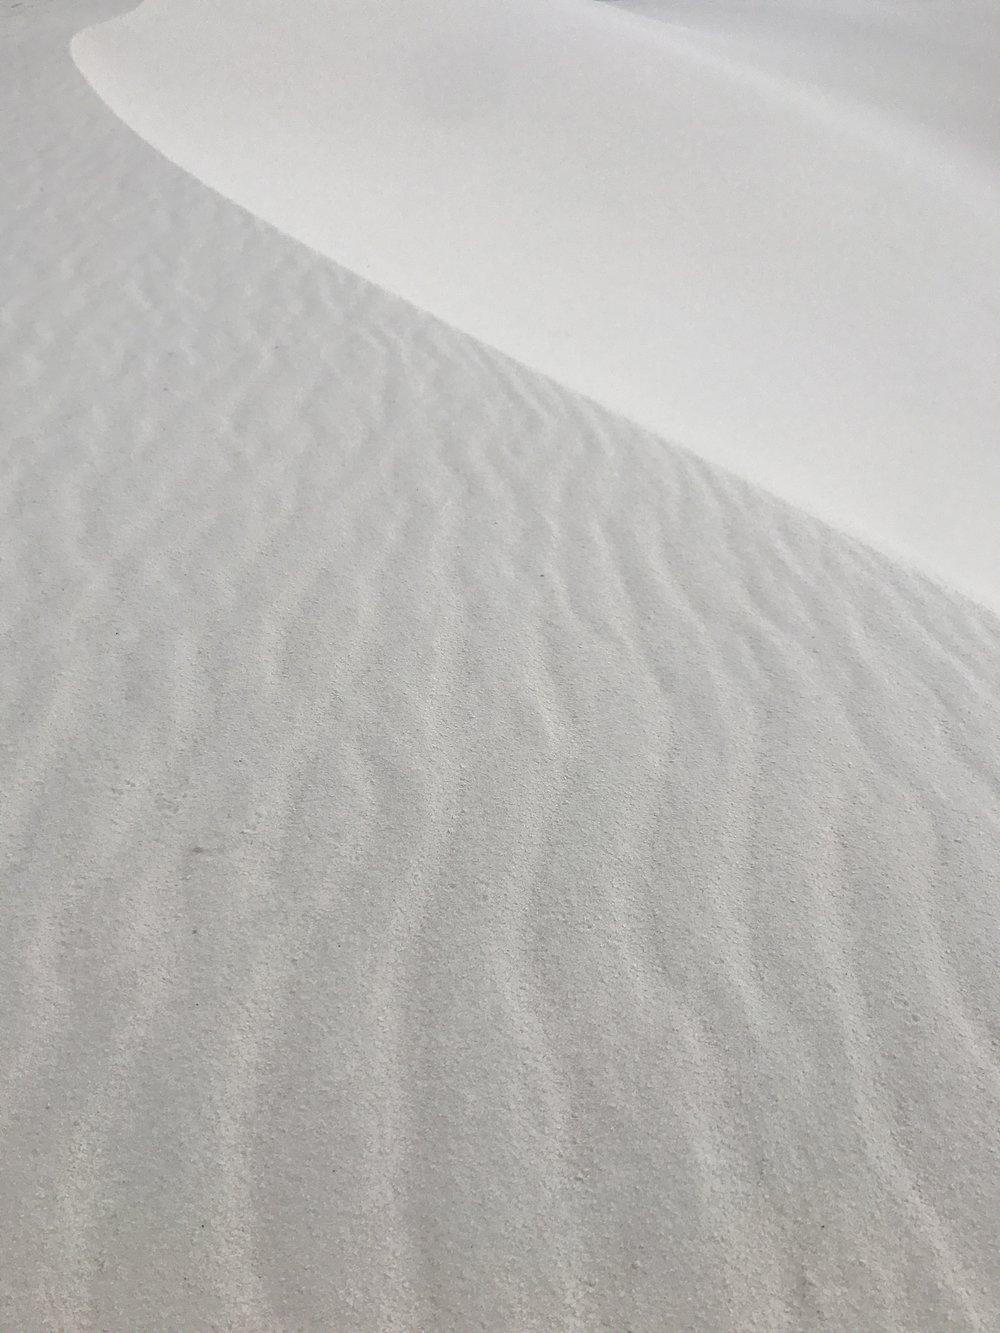 Par en Par _ On the Road _ White Sands 4.JPG